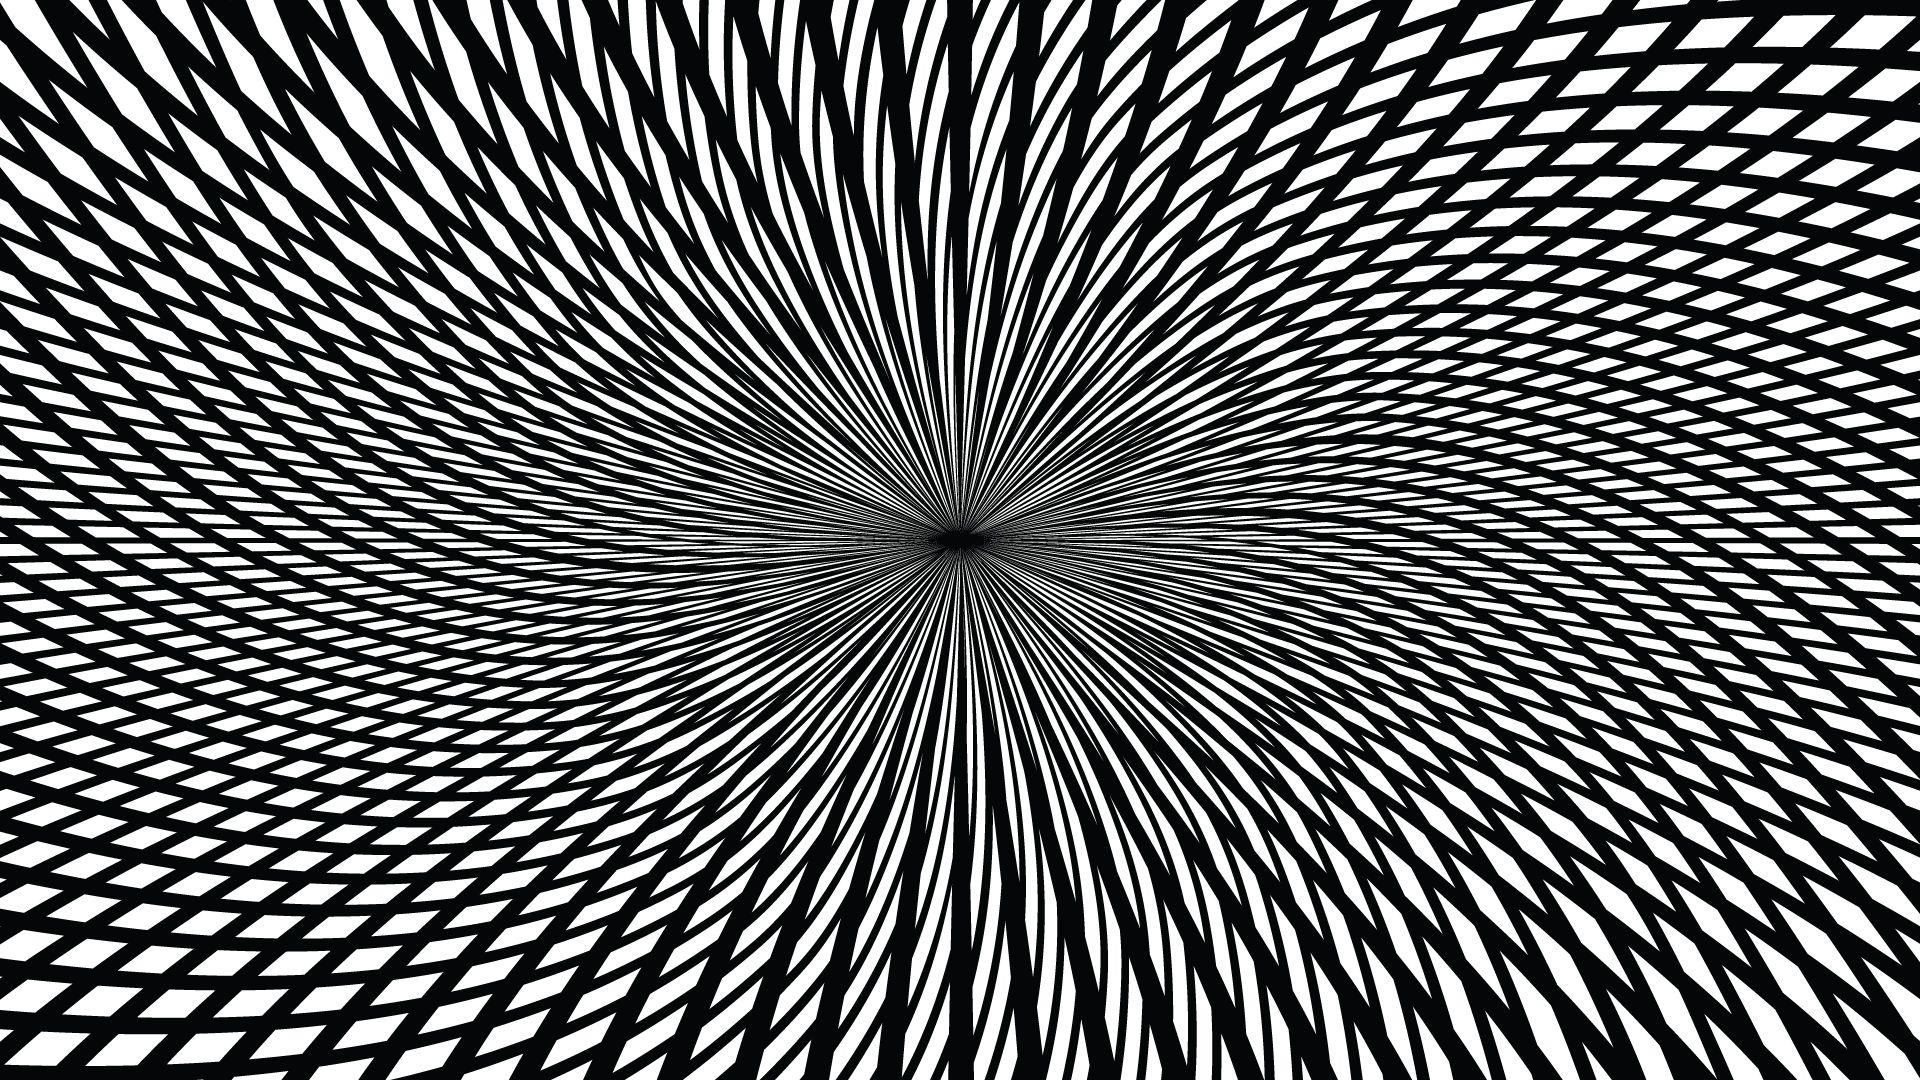 Intense Black And White Diamond Pattern In 2019 Optical